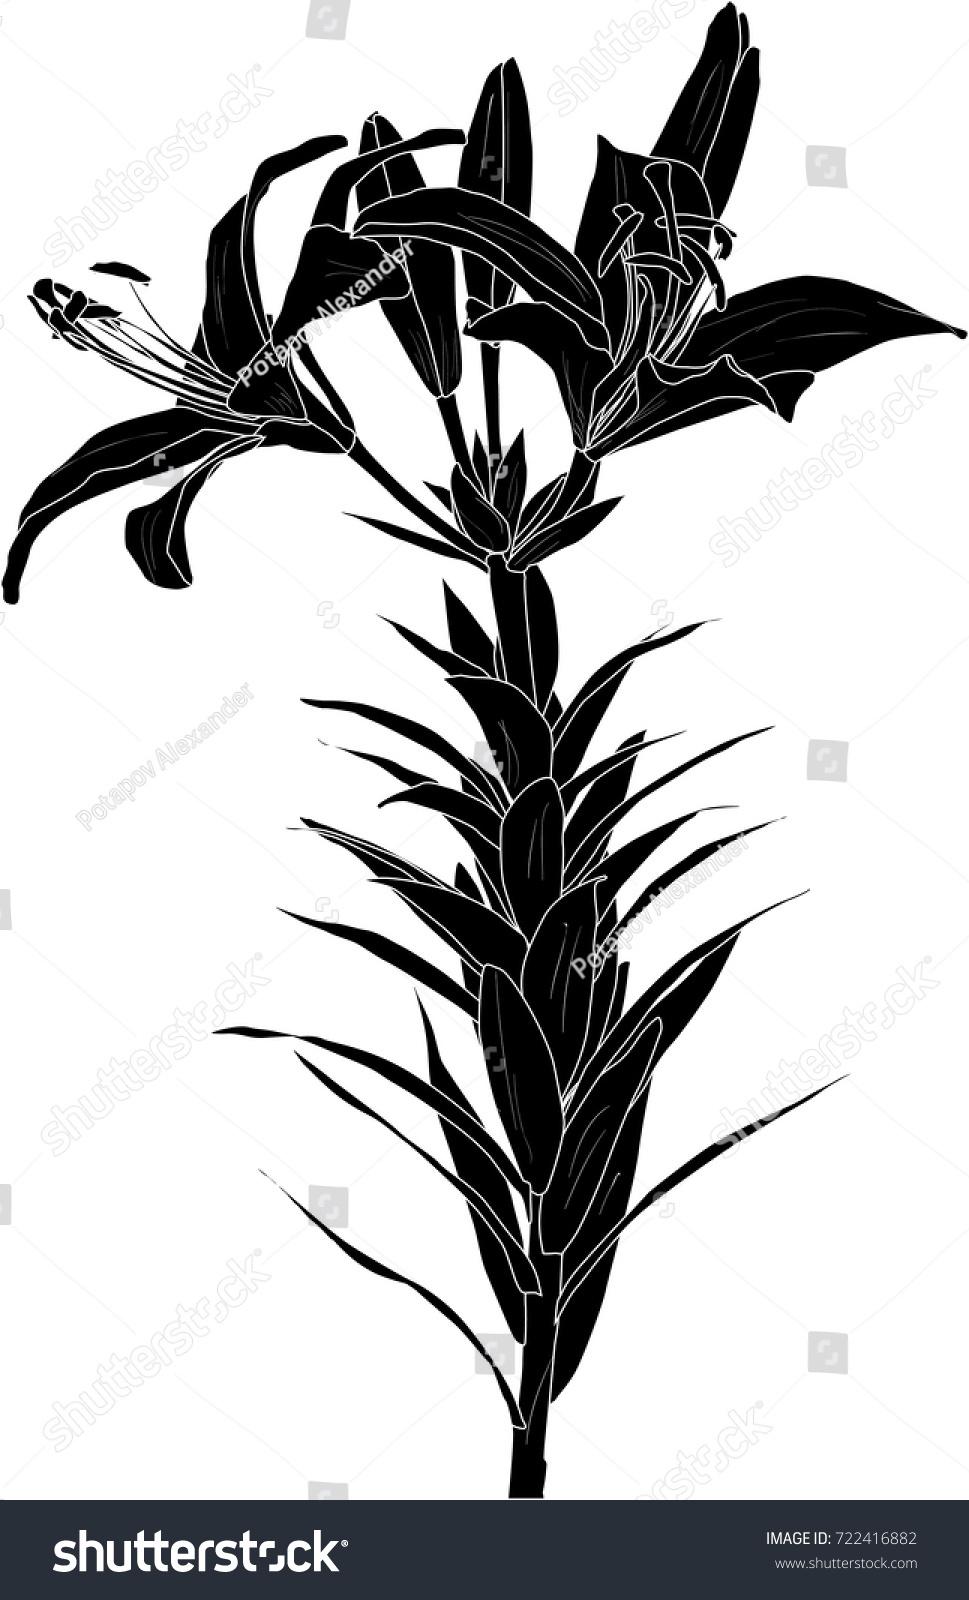 Illustration black lily flower silhouette isolated stock vector illustration with black lily flower silhouette isolated on white background izmirmasajfo